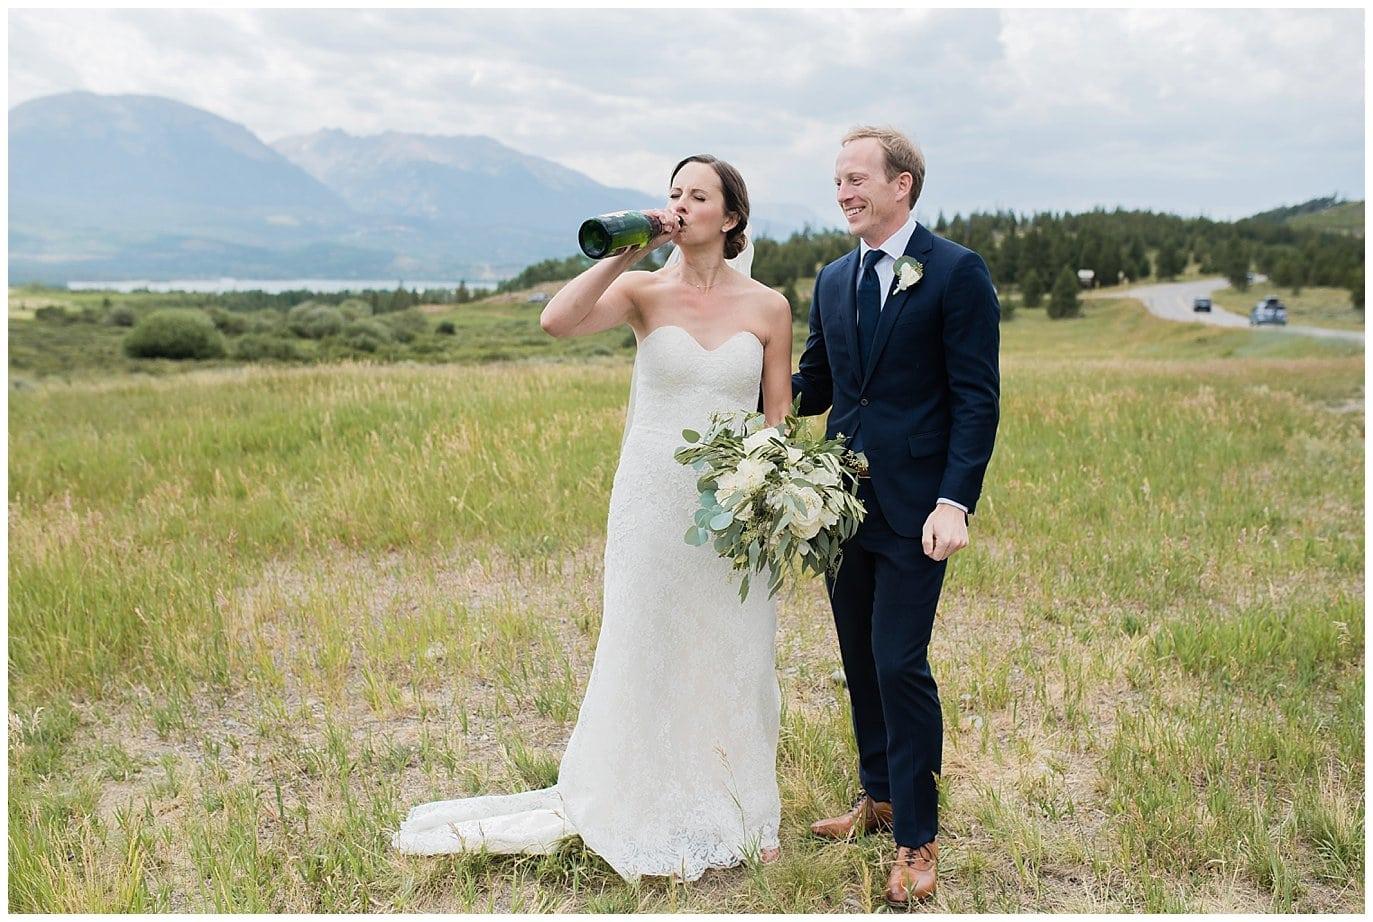 celebratory champagne before wedding ceremony at Arapahoe Basin Black Mountain Lodge Wedding by Dillon Wedding Photographer Jennie Crate